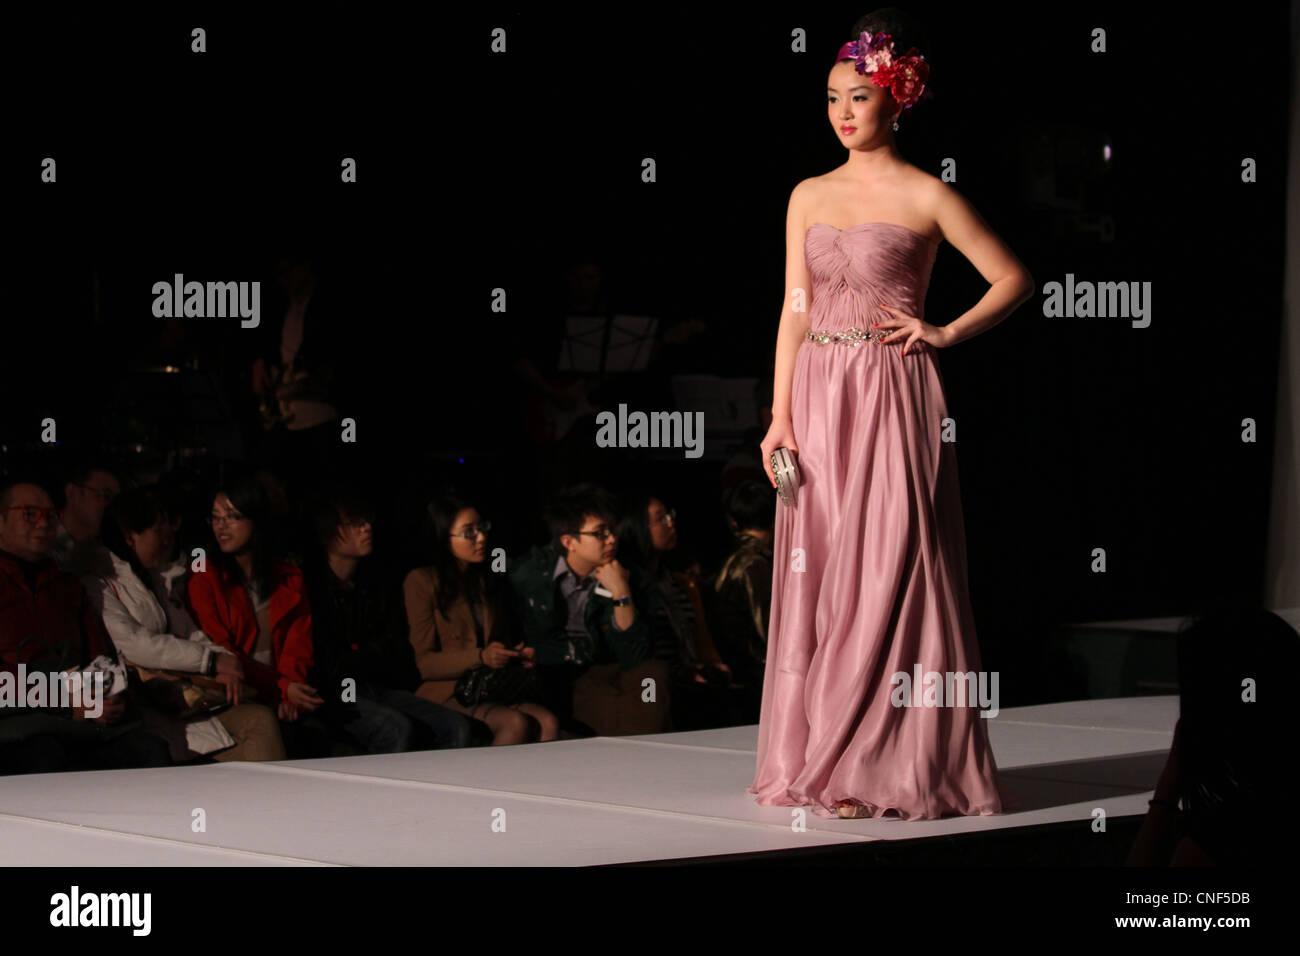 chinese fashion show runway female model catwalk - Stock Image